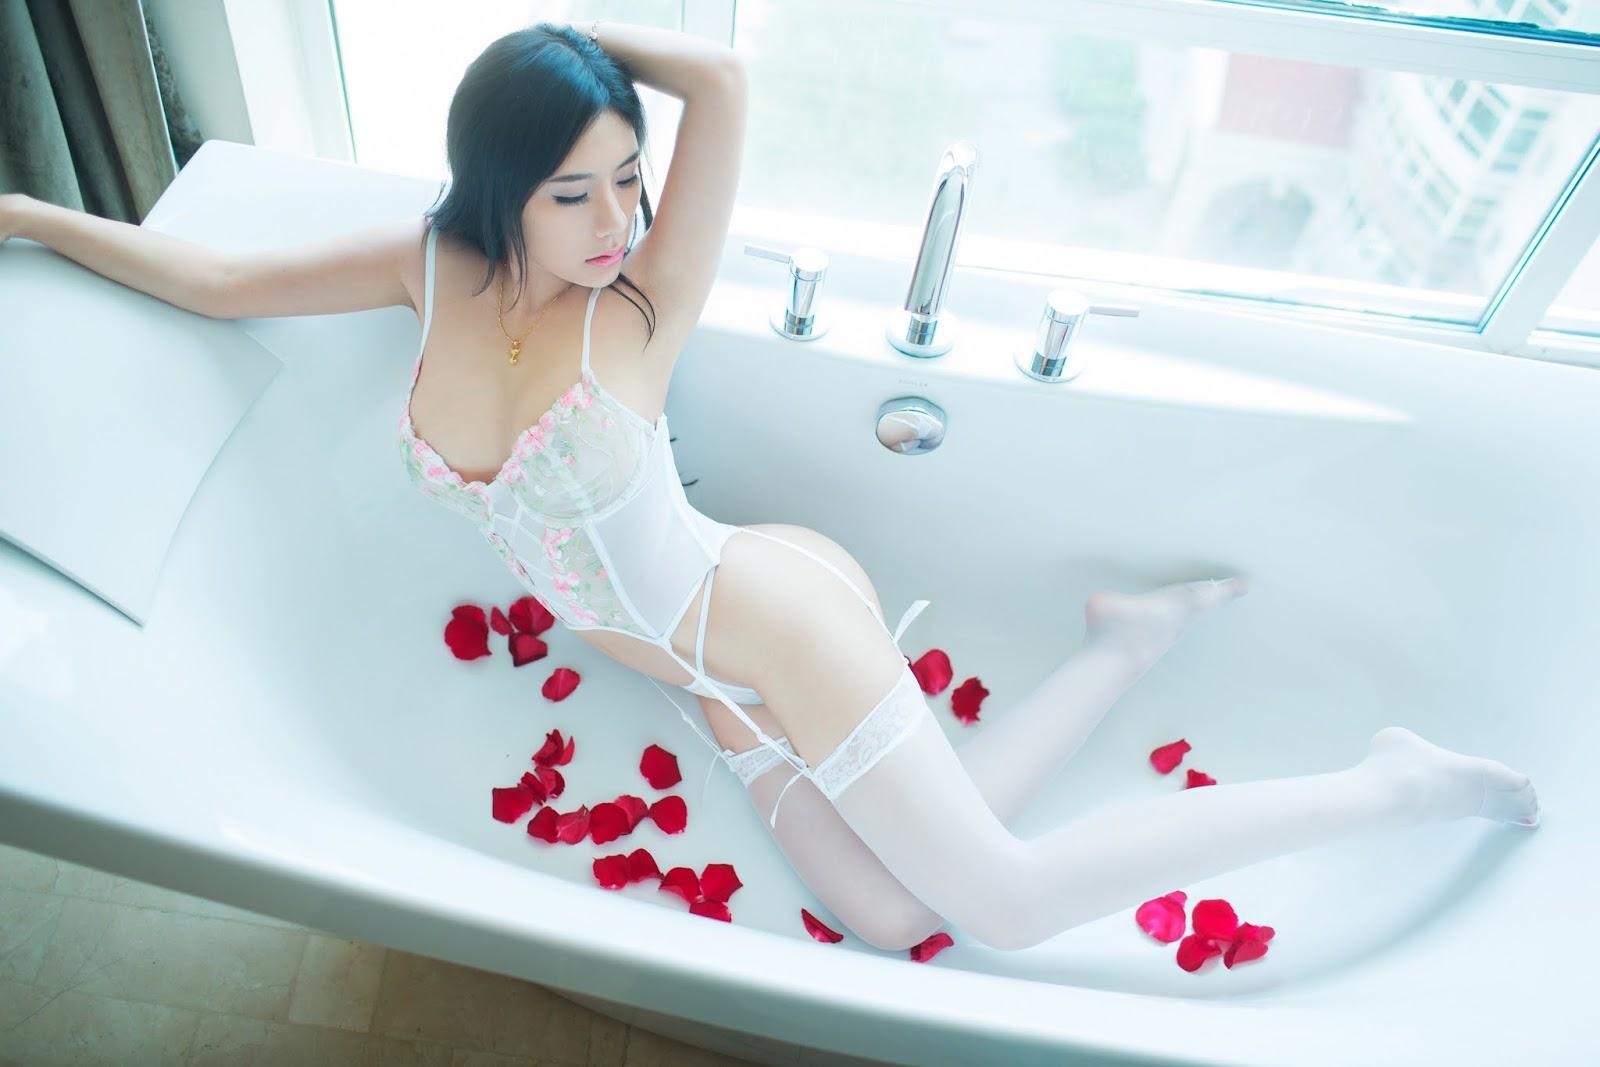 %25C2%25AC%252BO 15 - Hot Sexy Model TUIGIRL NO.46 Nude